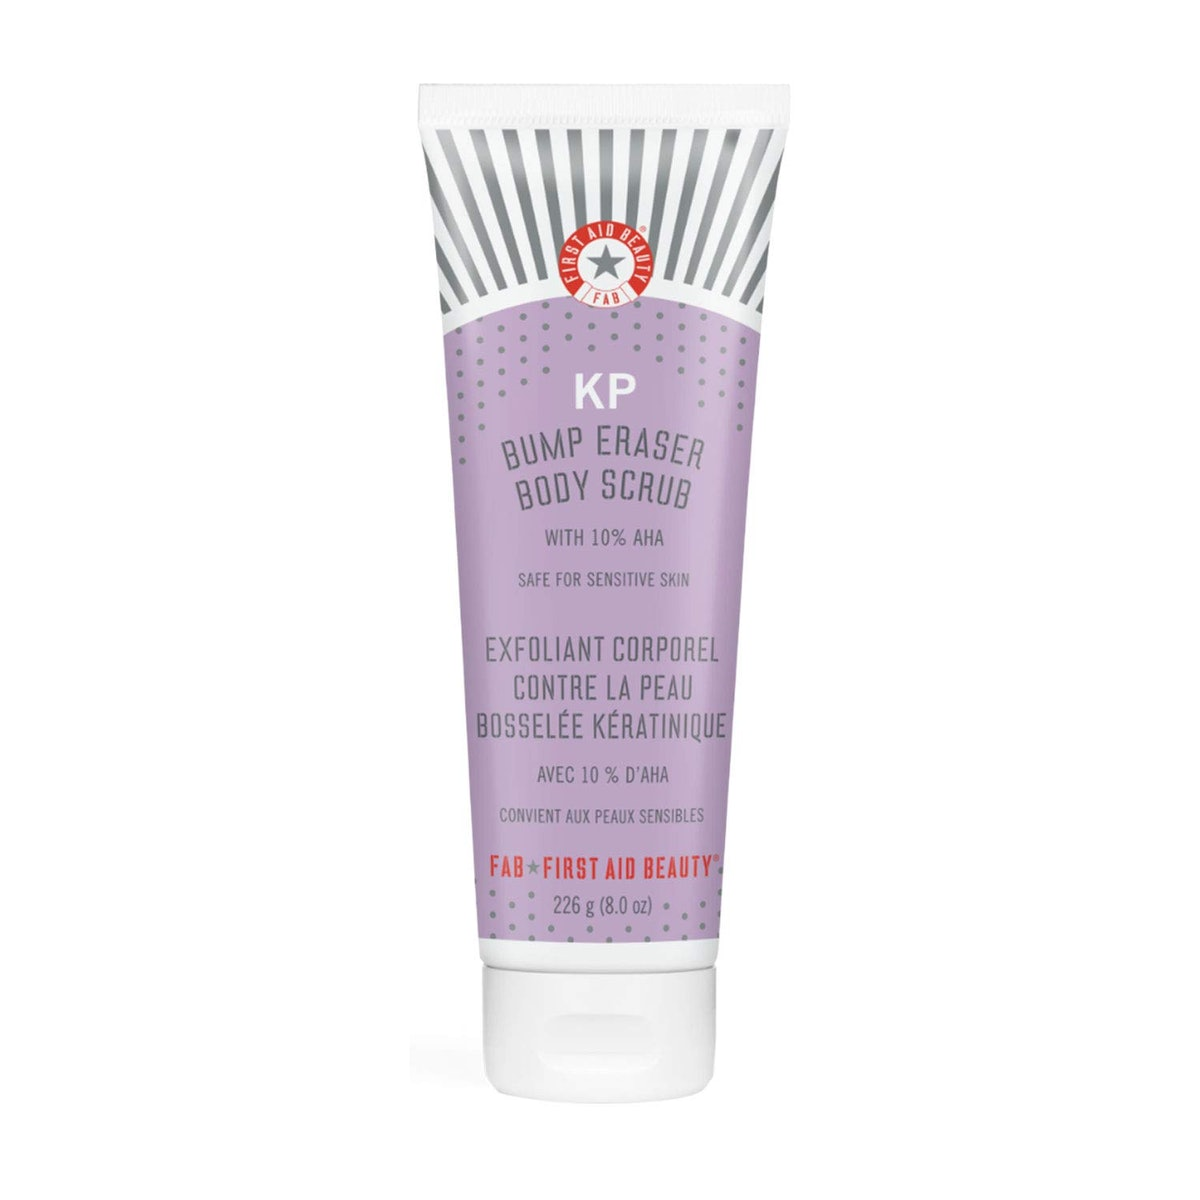 First Aid Beauty KP Bump Eraser Body Scrub